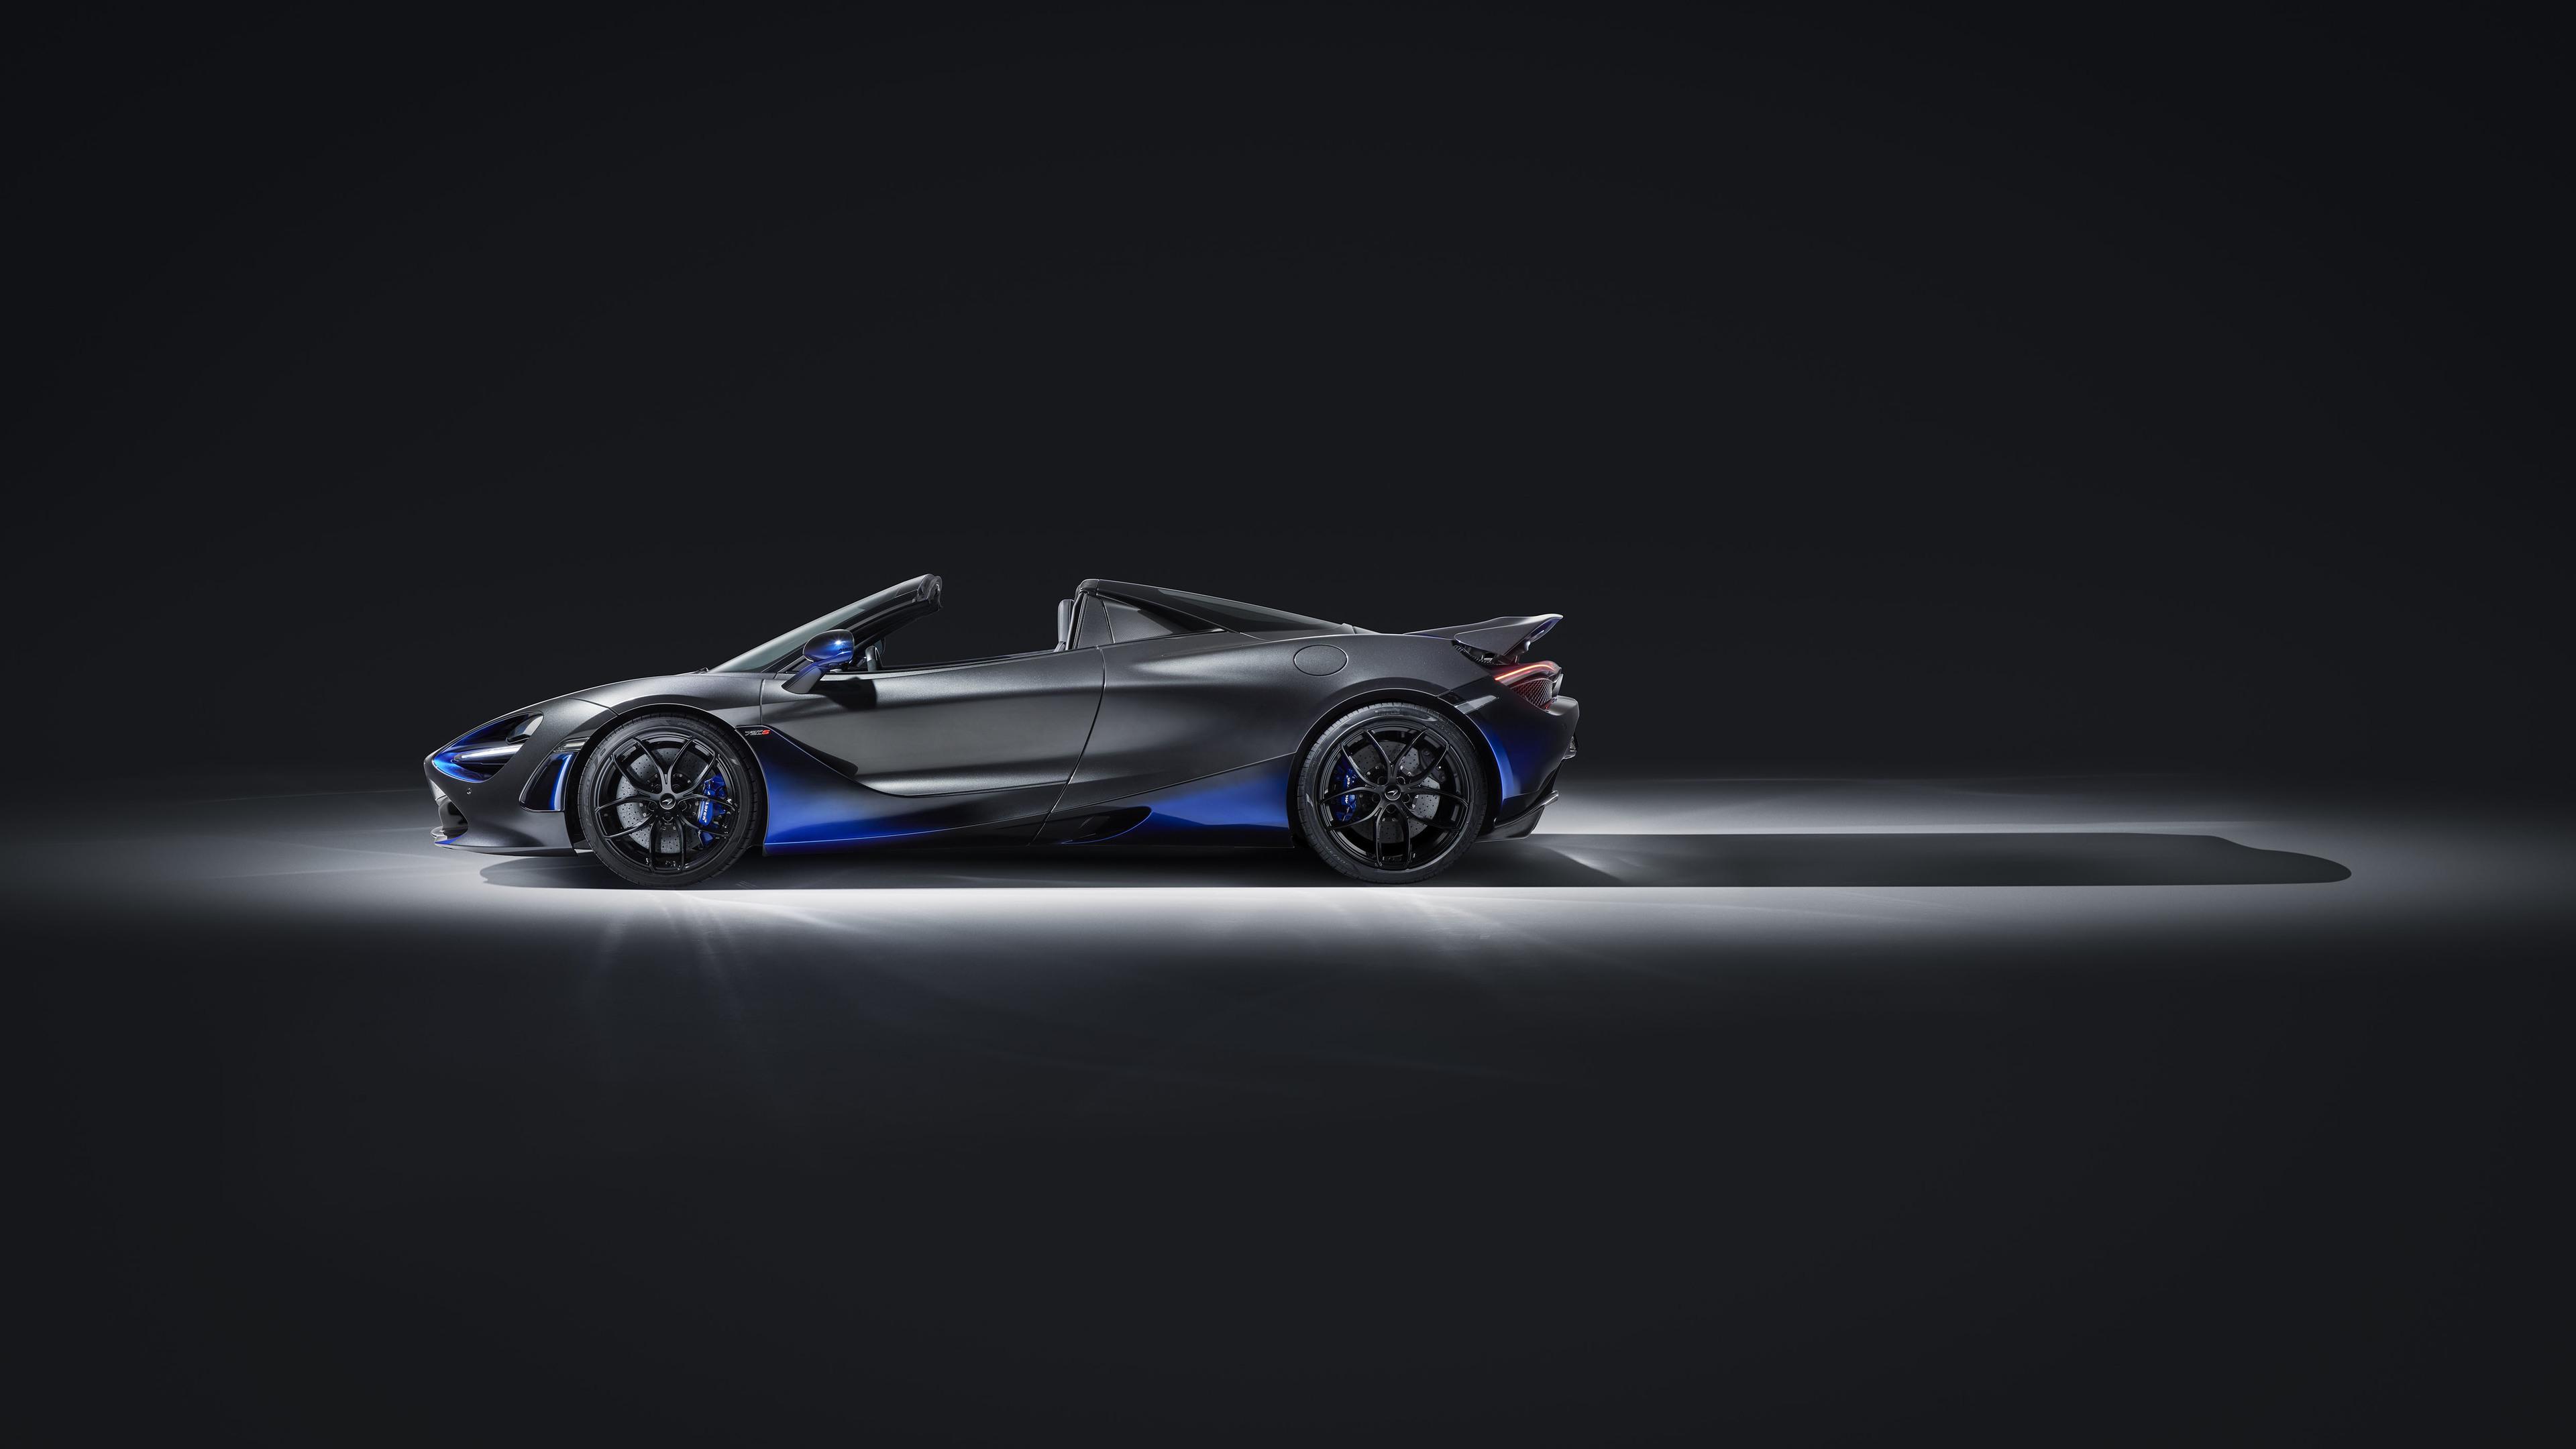 Wallpaper 4k Mclaren Mso 720s Spider 2019 Side View 4k 2019 Cars